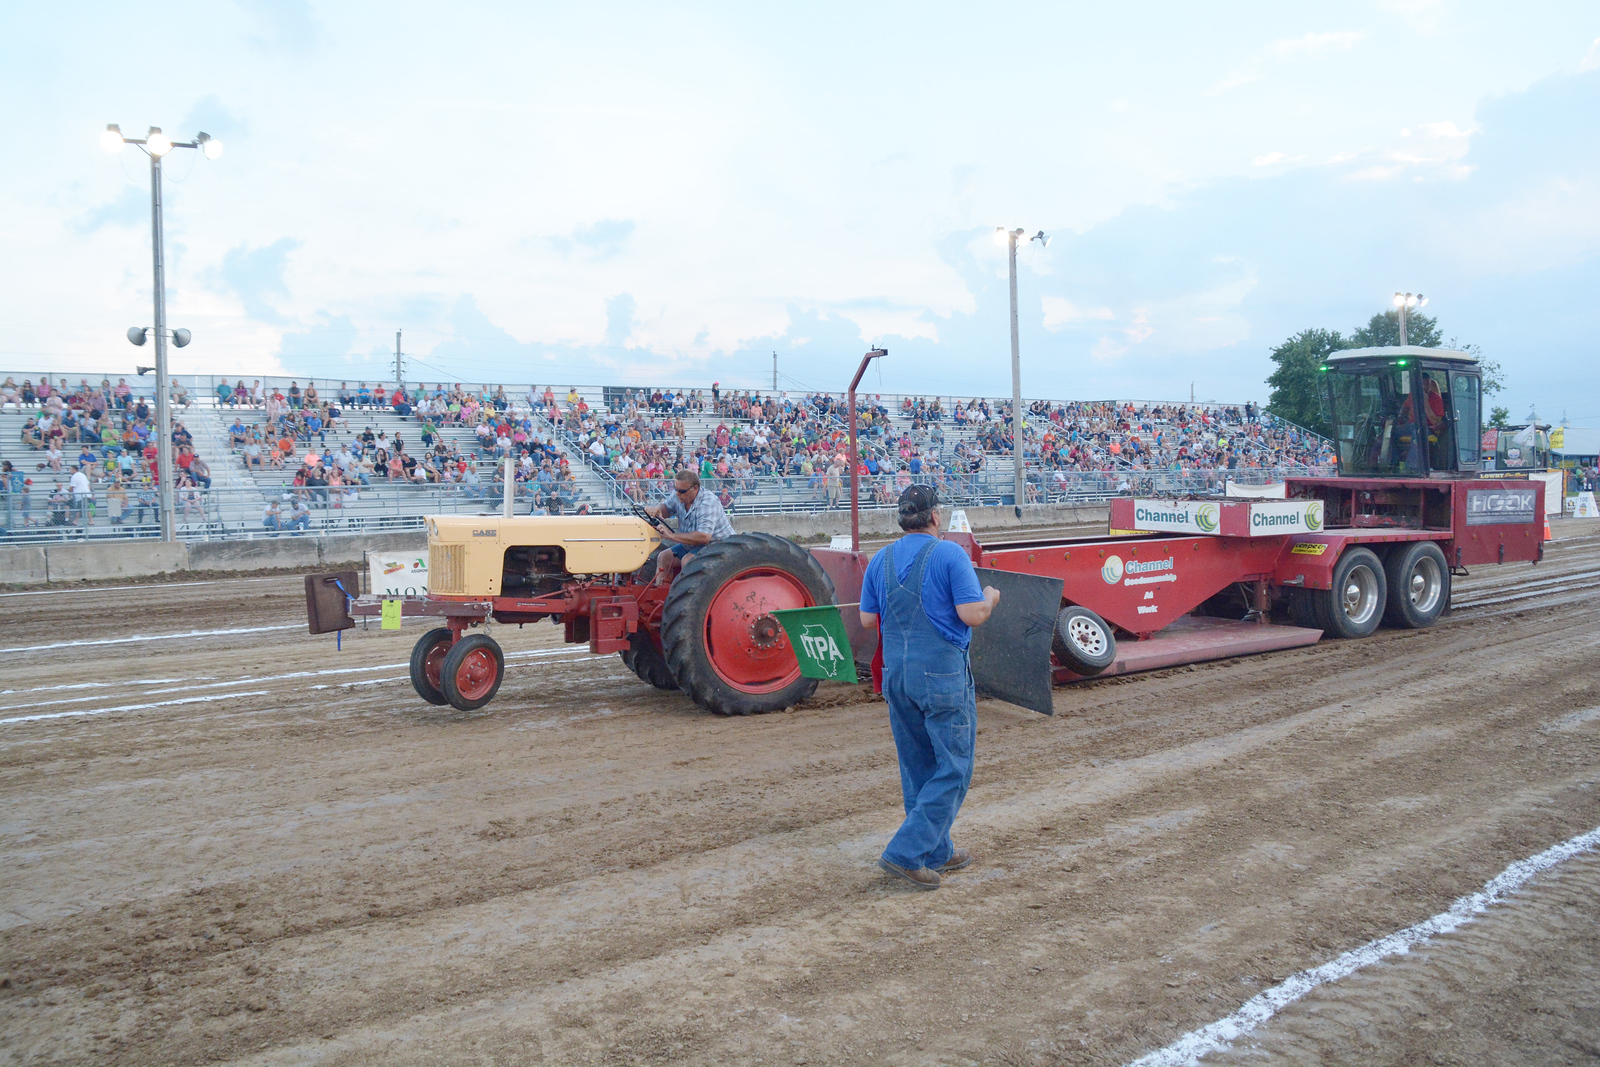 Monroe County Fair's Tractor Pulls